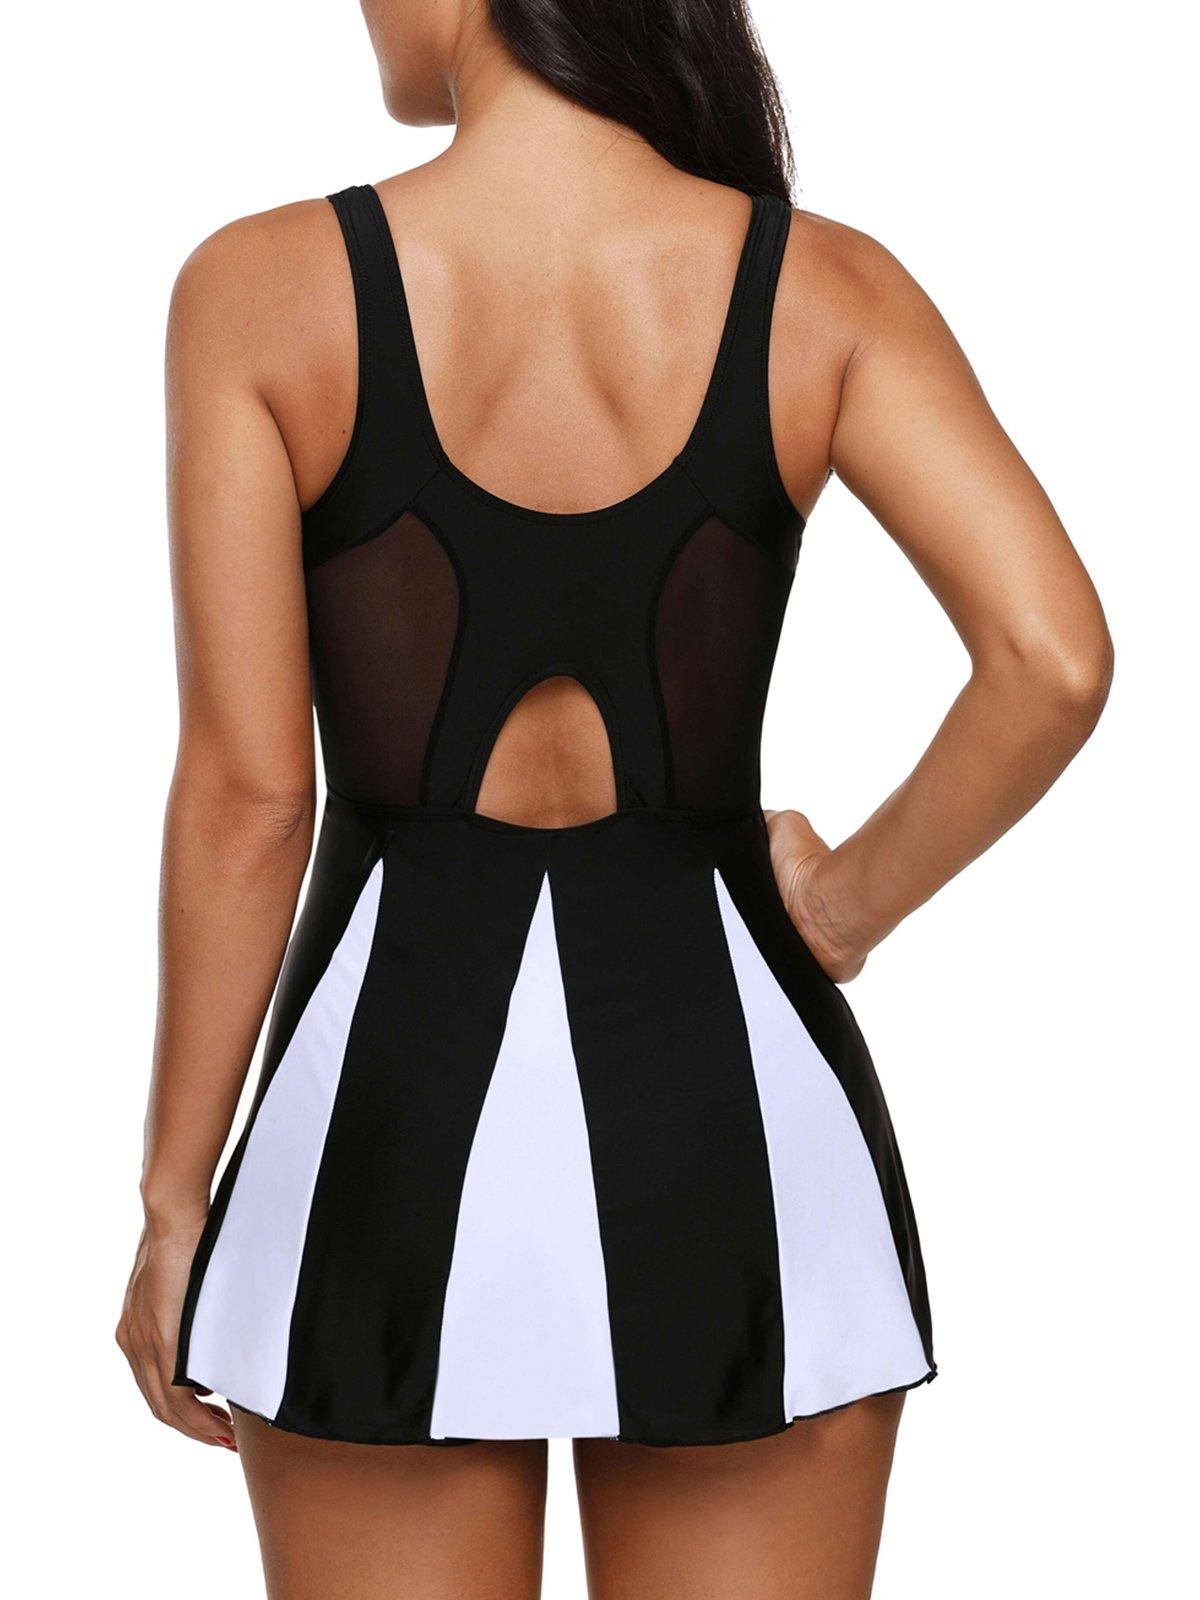 Century Star Women's Elegant Dress One Piece Boy-Leg Bathing Suit Swimdress Printed Swimwear Swimsuits Black White XL(US 12-14) by Century Star (Image #2)